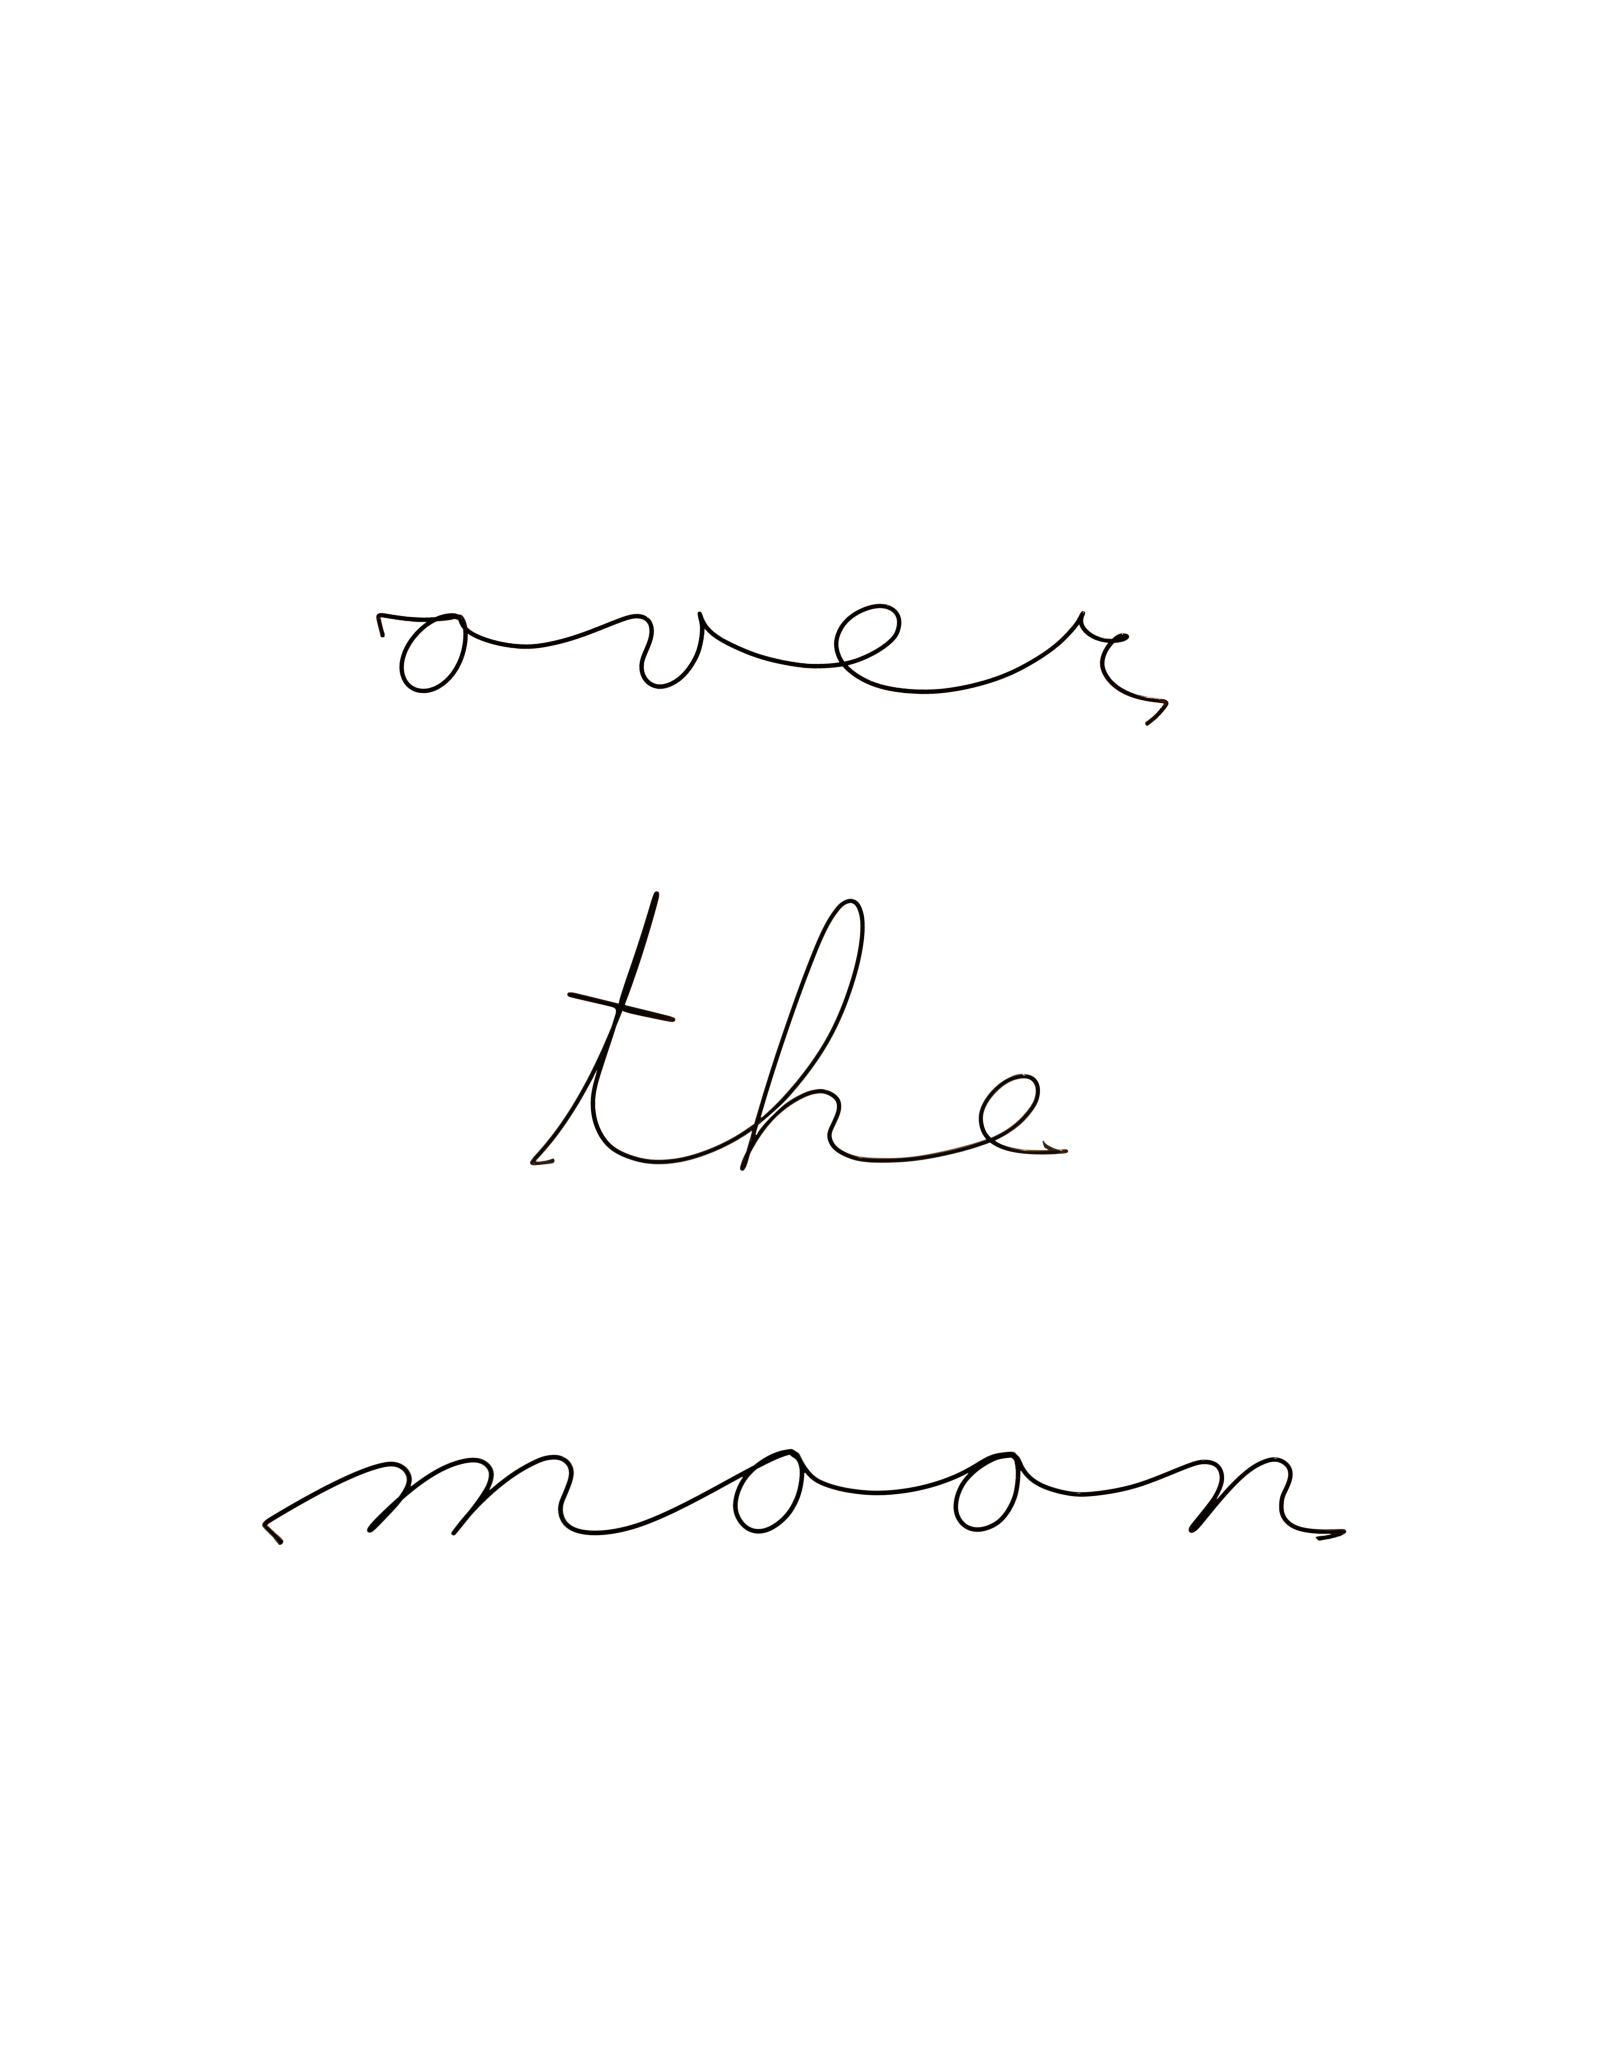 Gauge NYC 'over the moon' Wire Word Poetic